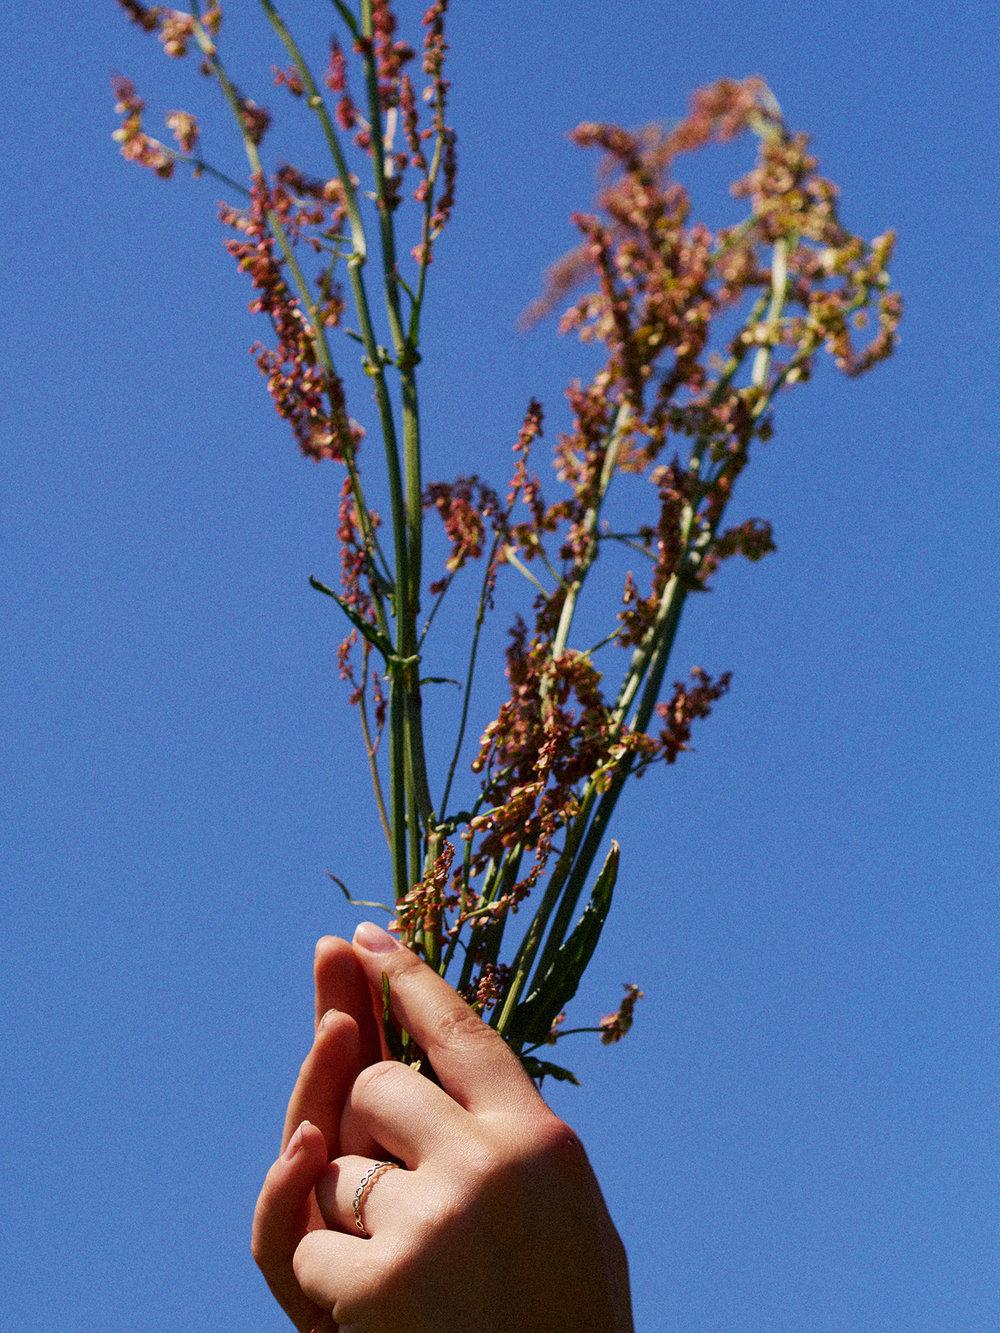 029-icon-artist-management-Kristin-Vicari-Girls and Flowers-29.jpg